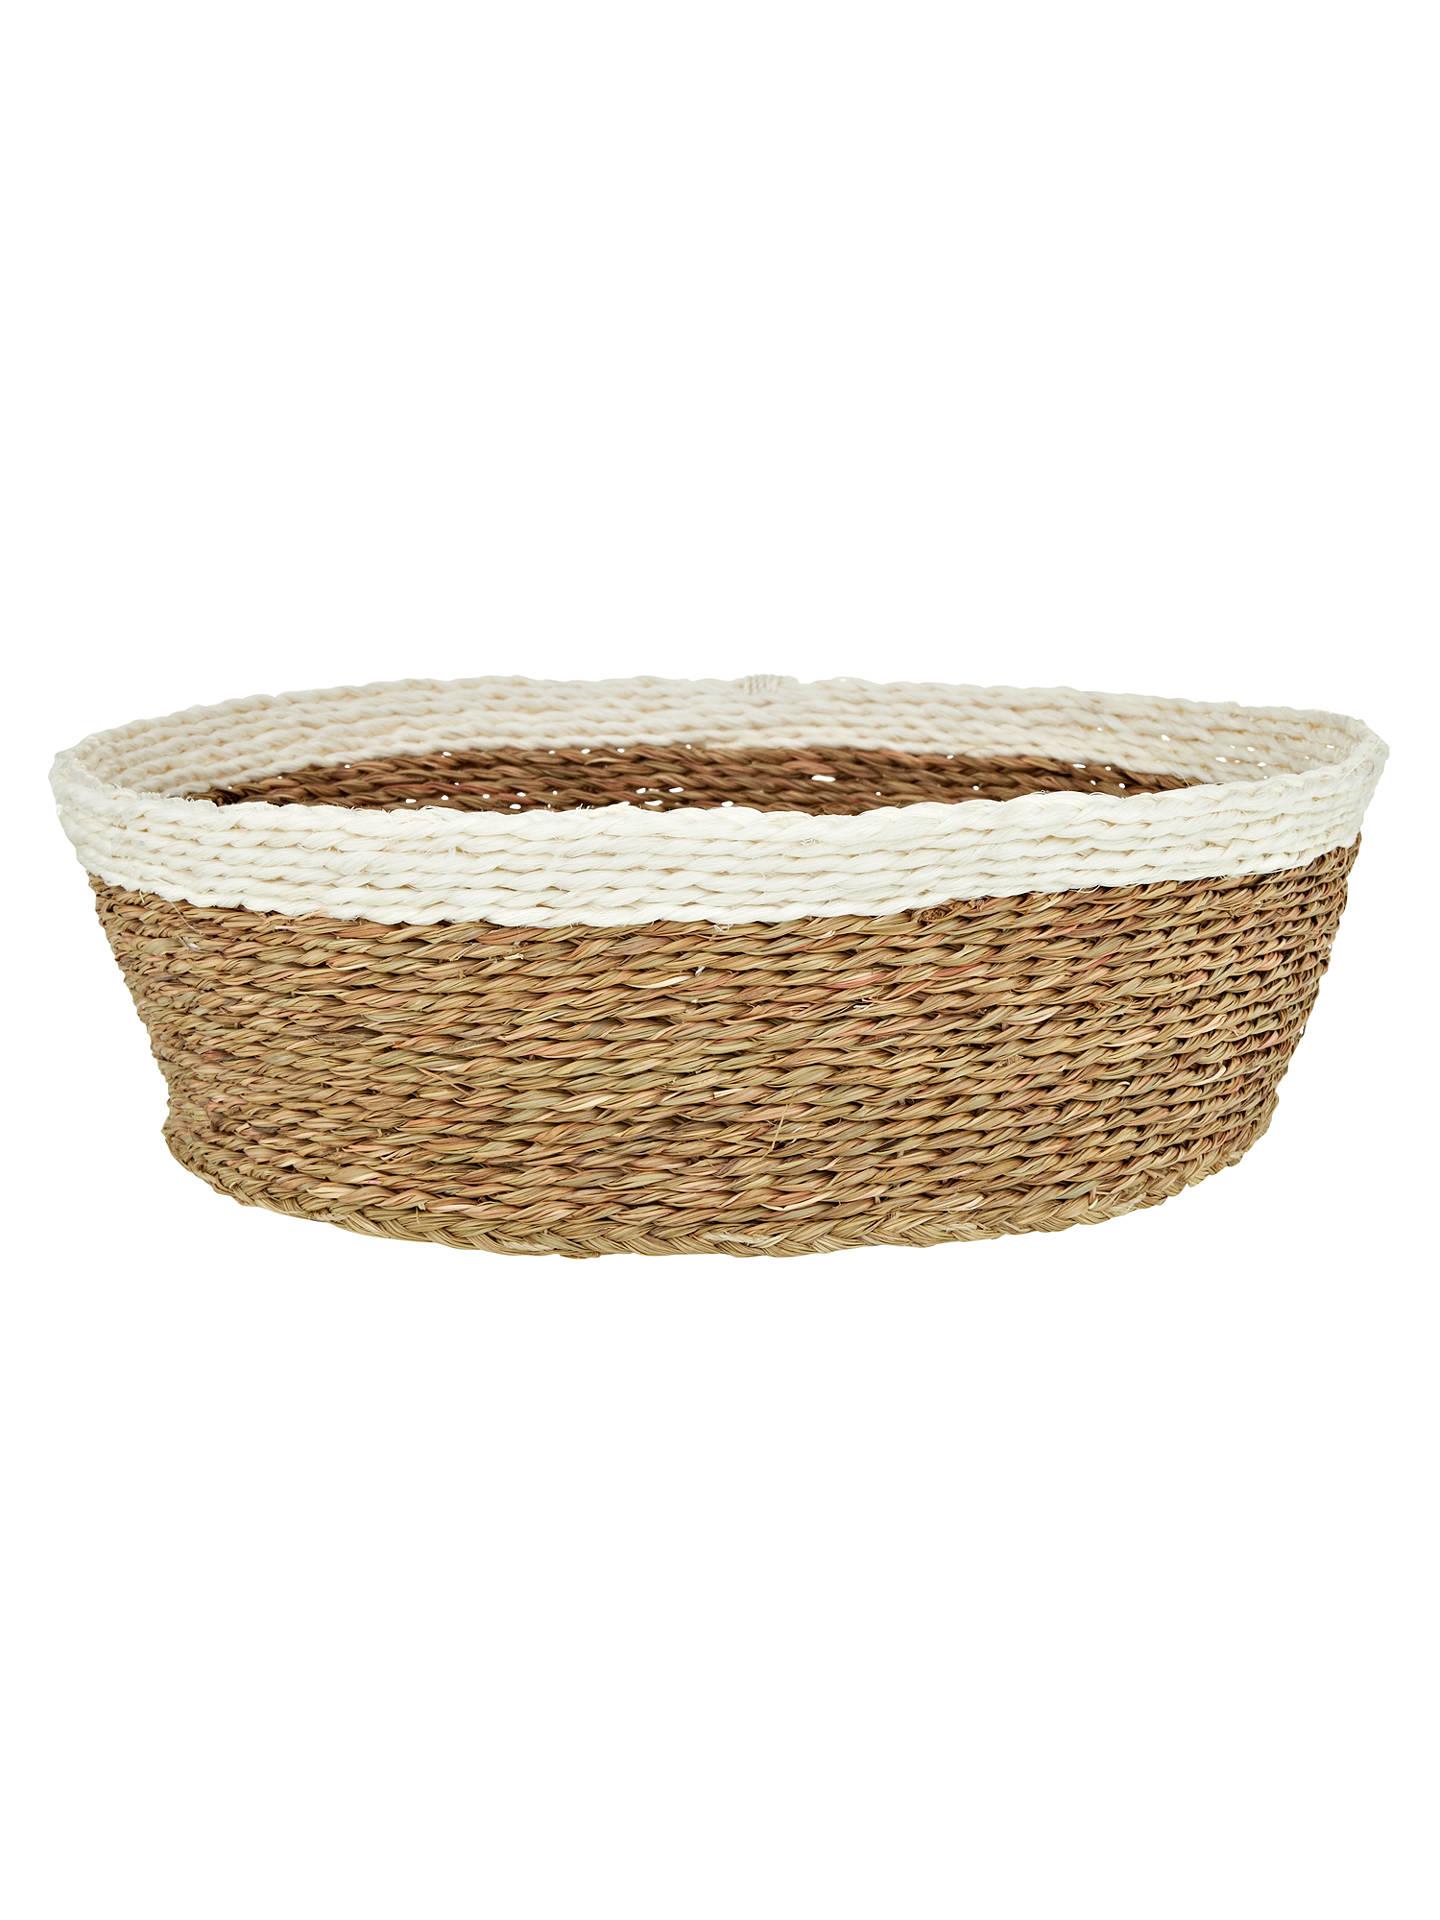 Gone Rural Woven Grass Bread Basket Smoke White At Johnlewis Com